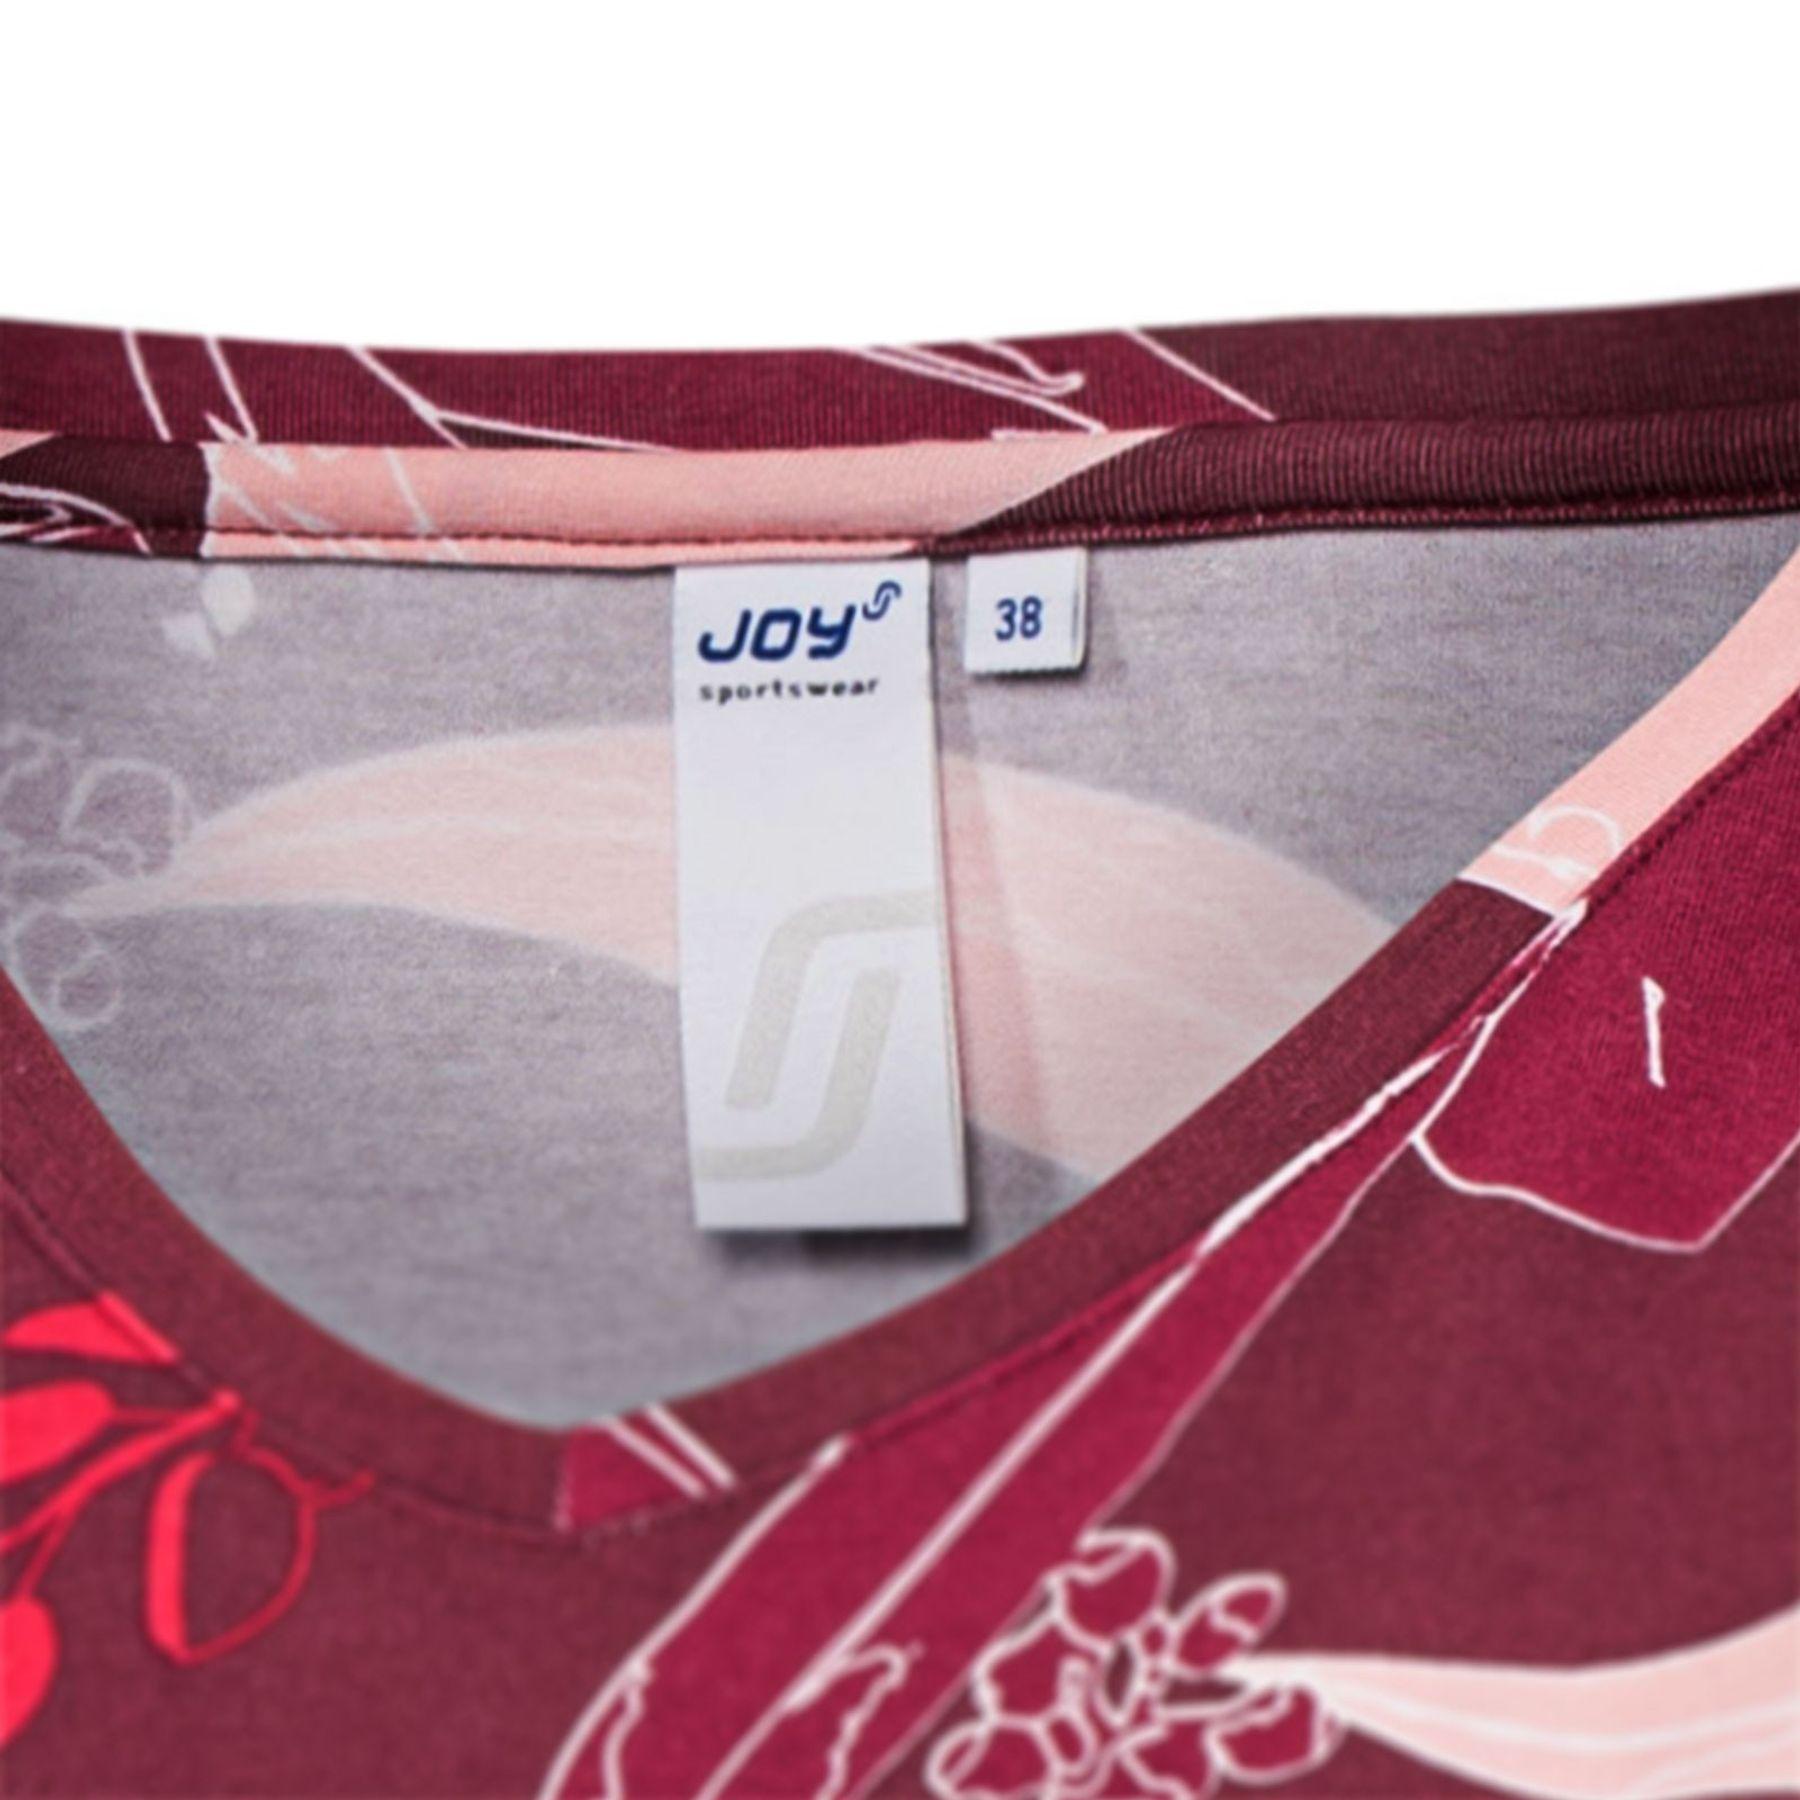 Joy - Damen T-Shirt in verschiedenen Farbvarianten, Aurelia (34530) – Bild 7